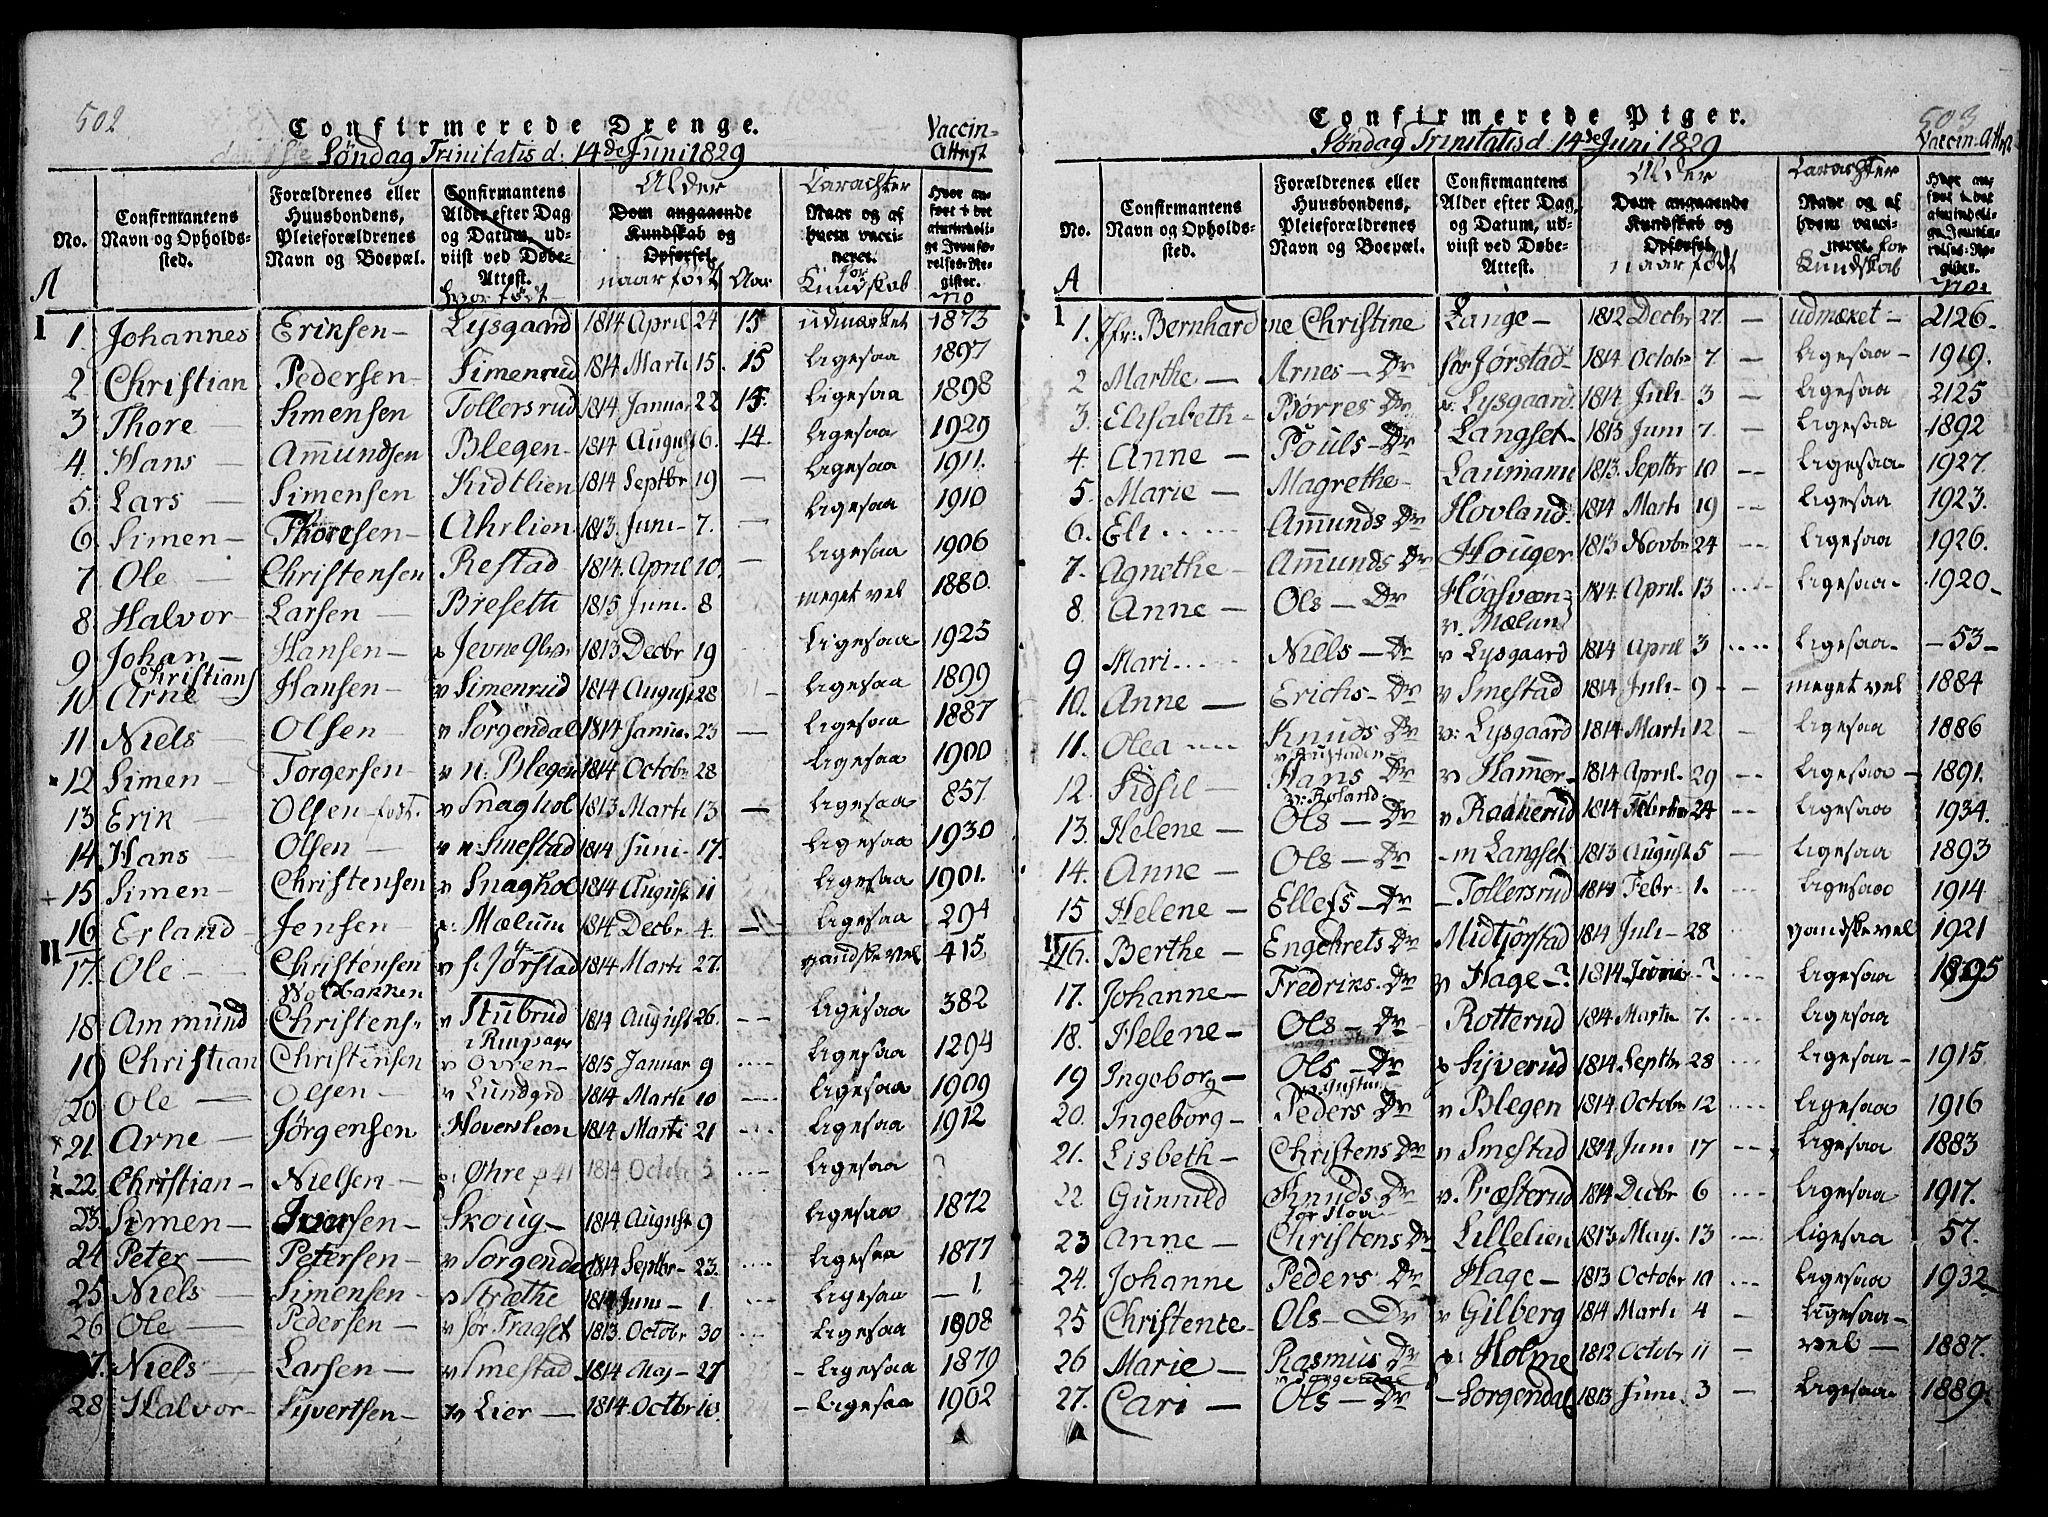 SAH, Fåberg prestekontor, Ministerialbok nr. 3, 1818-1833, s. 502-503